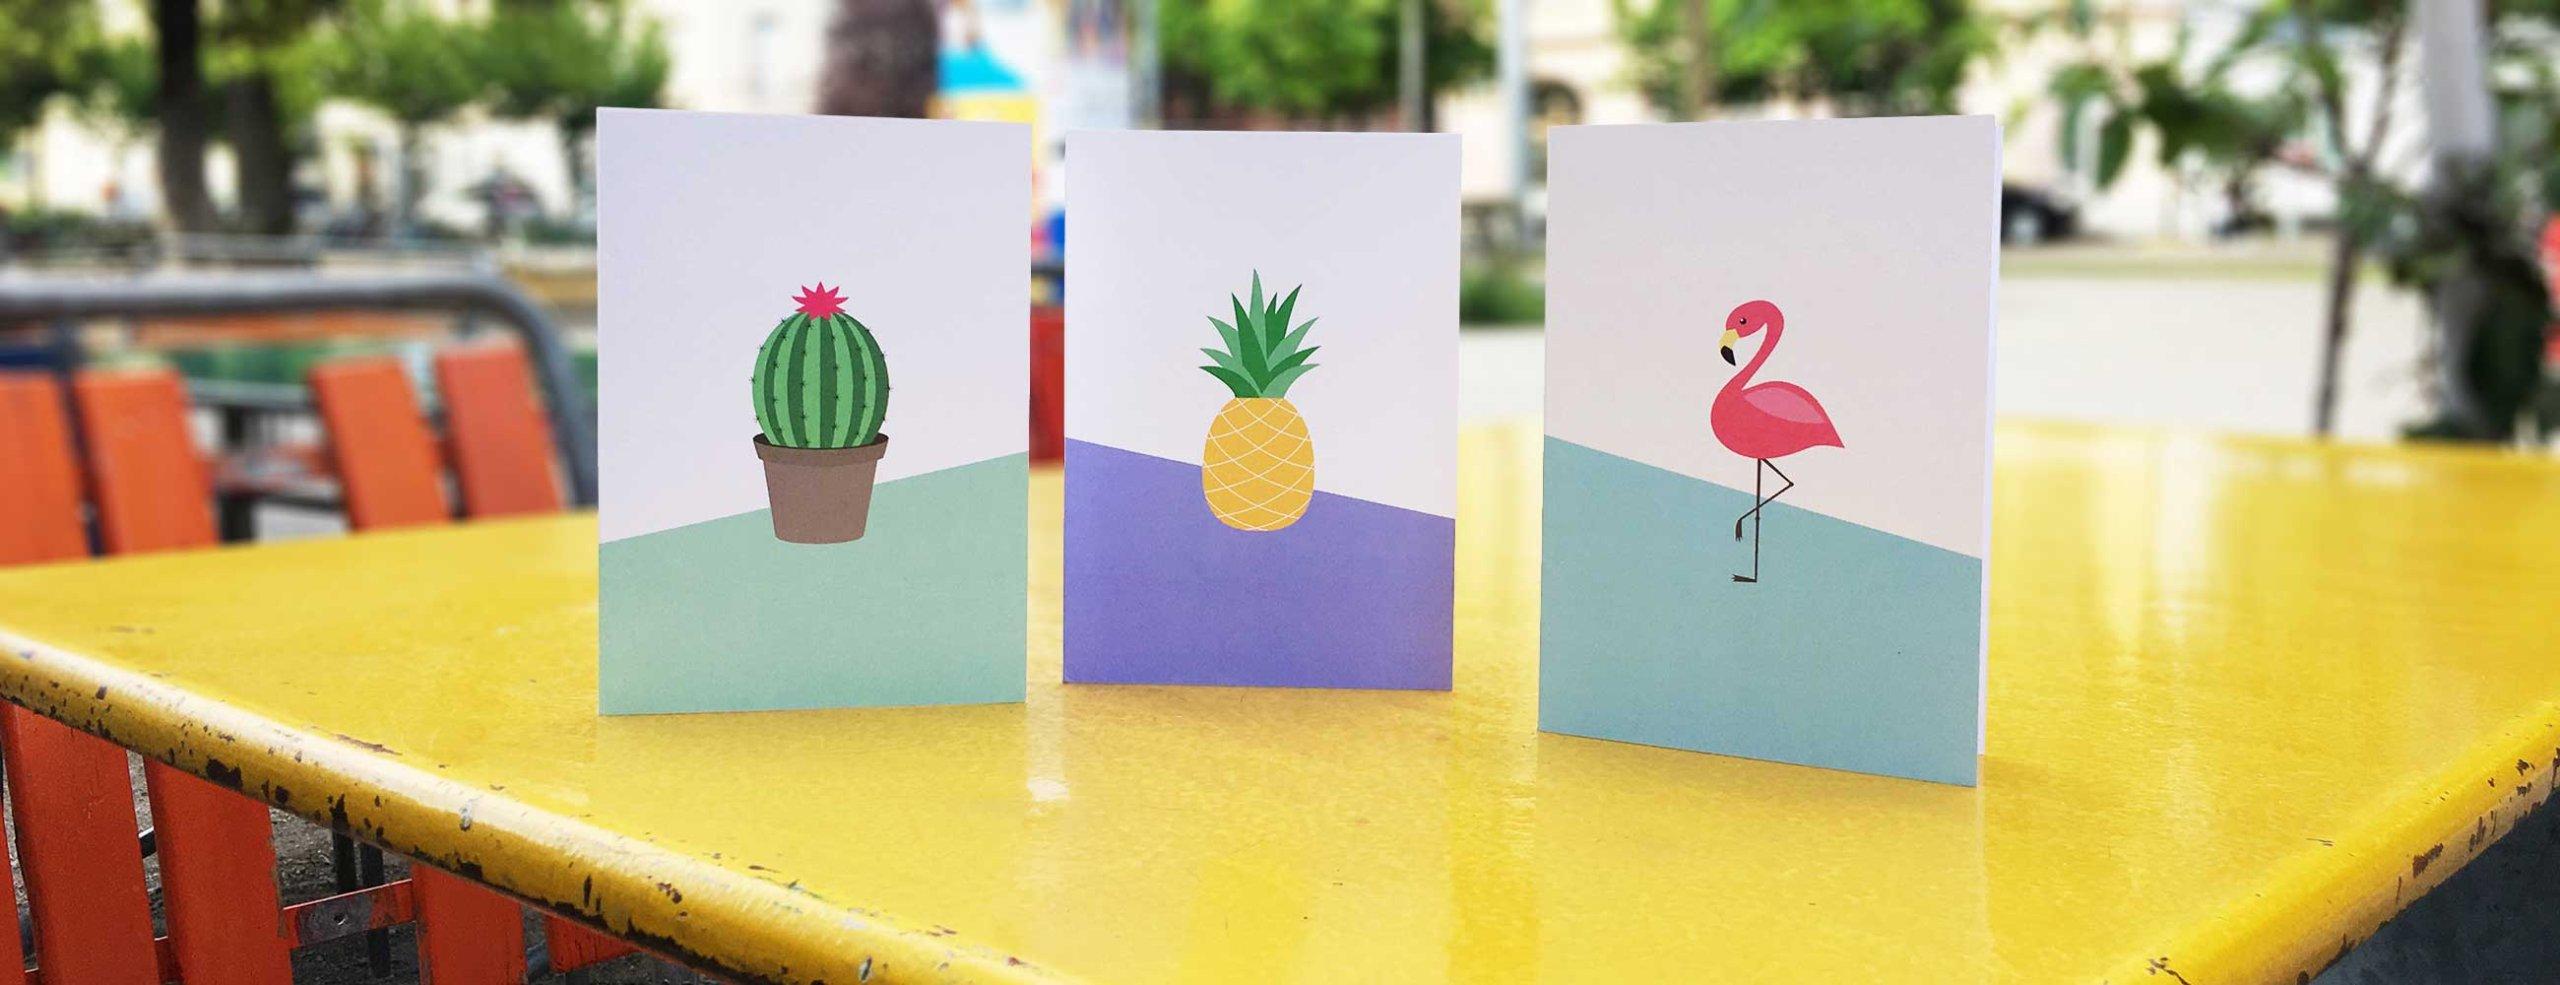 Frühlingskarten: Flamingo, Ananas, Kaktus